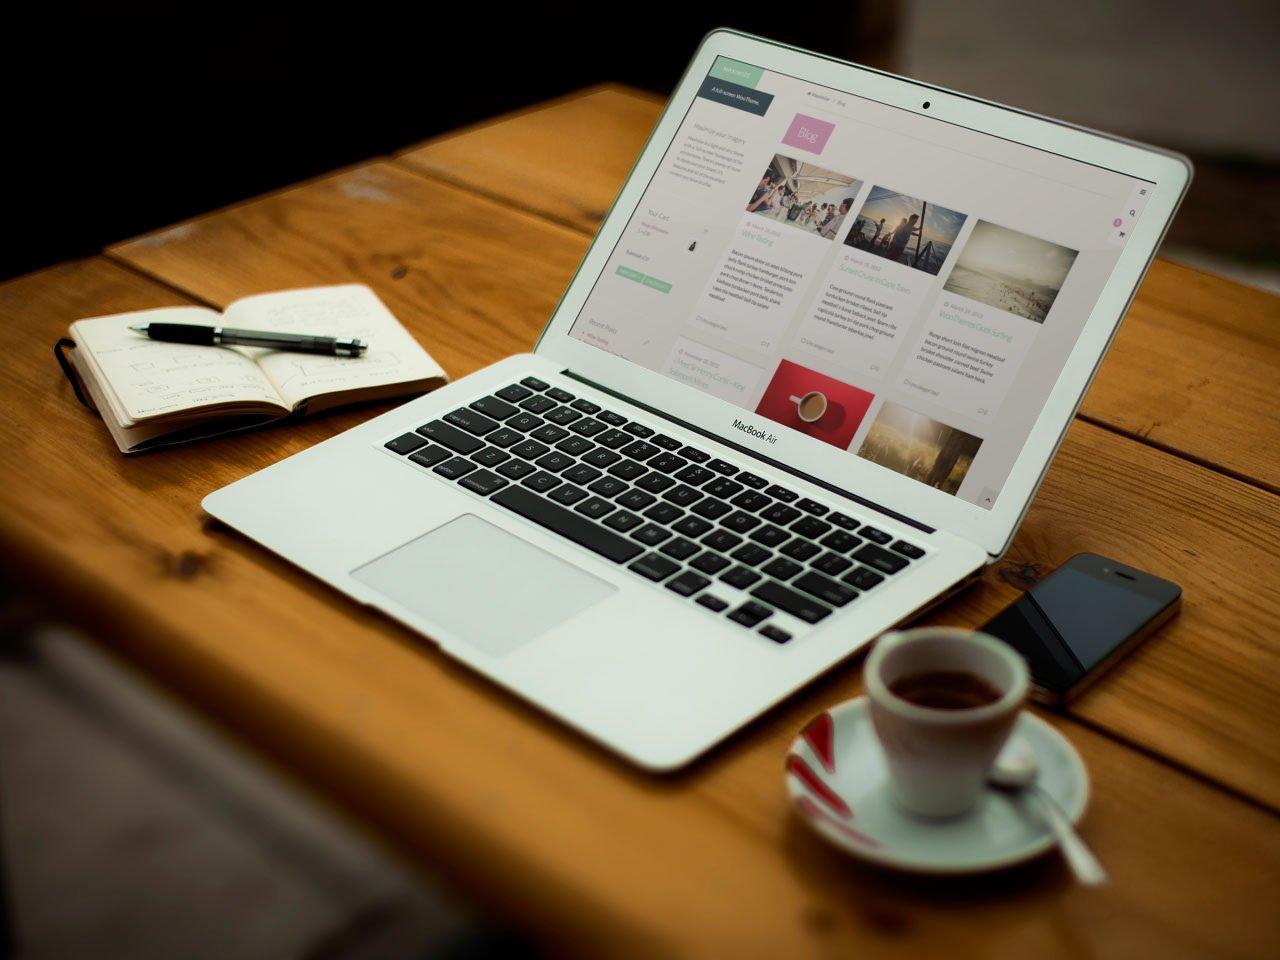 http://www.virtualars.it/wp-content/uploads/2018/09/blog-laptop-copy-2-1280x960.jpg